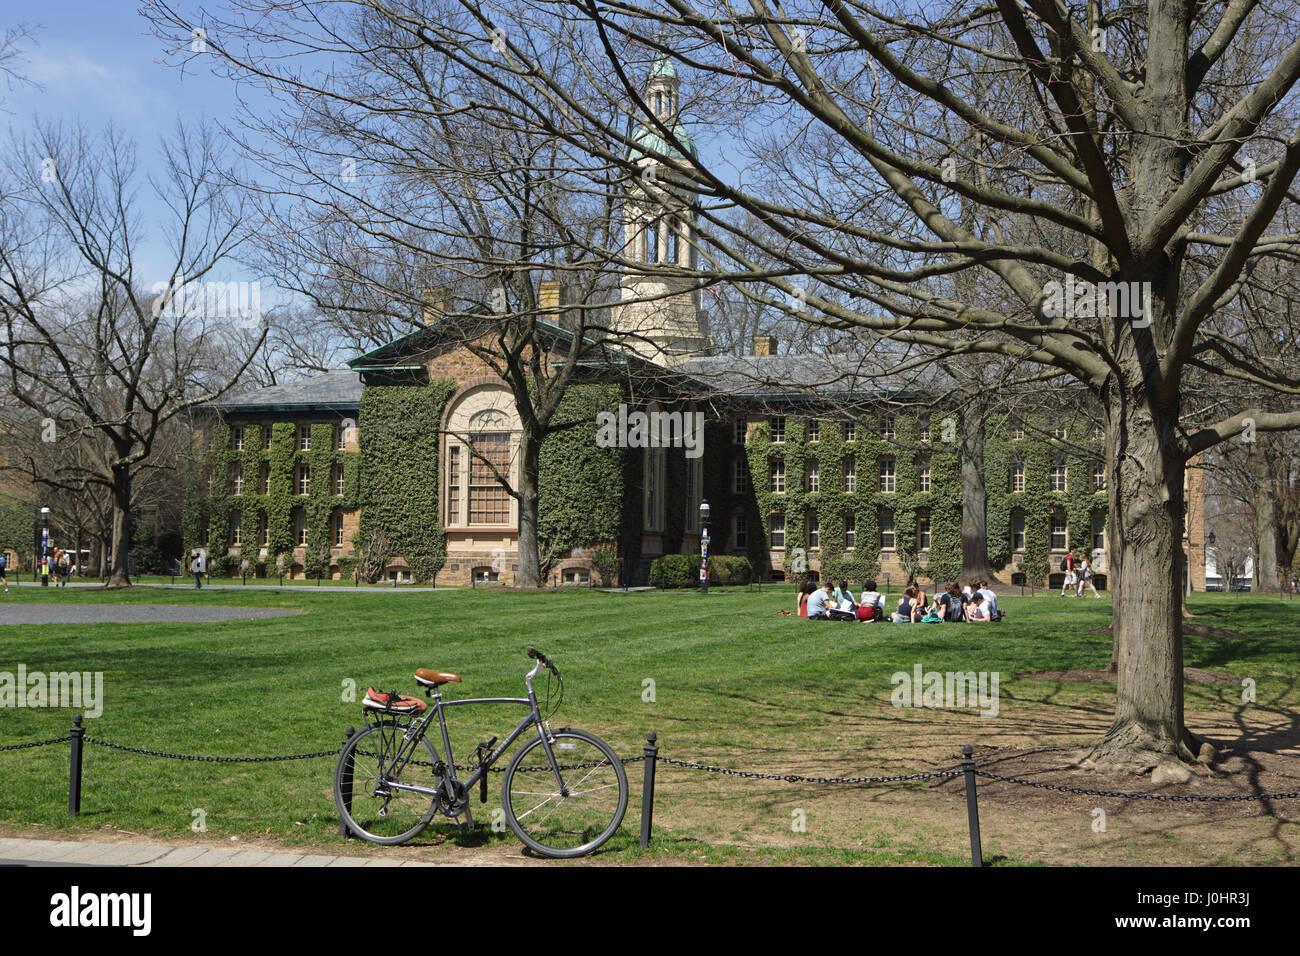 Princeton, NJ, USA - April 11, 2017: Princeton University Campus in spring. Nassau Hall and Cannon Green. Students - Stock Image